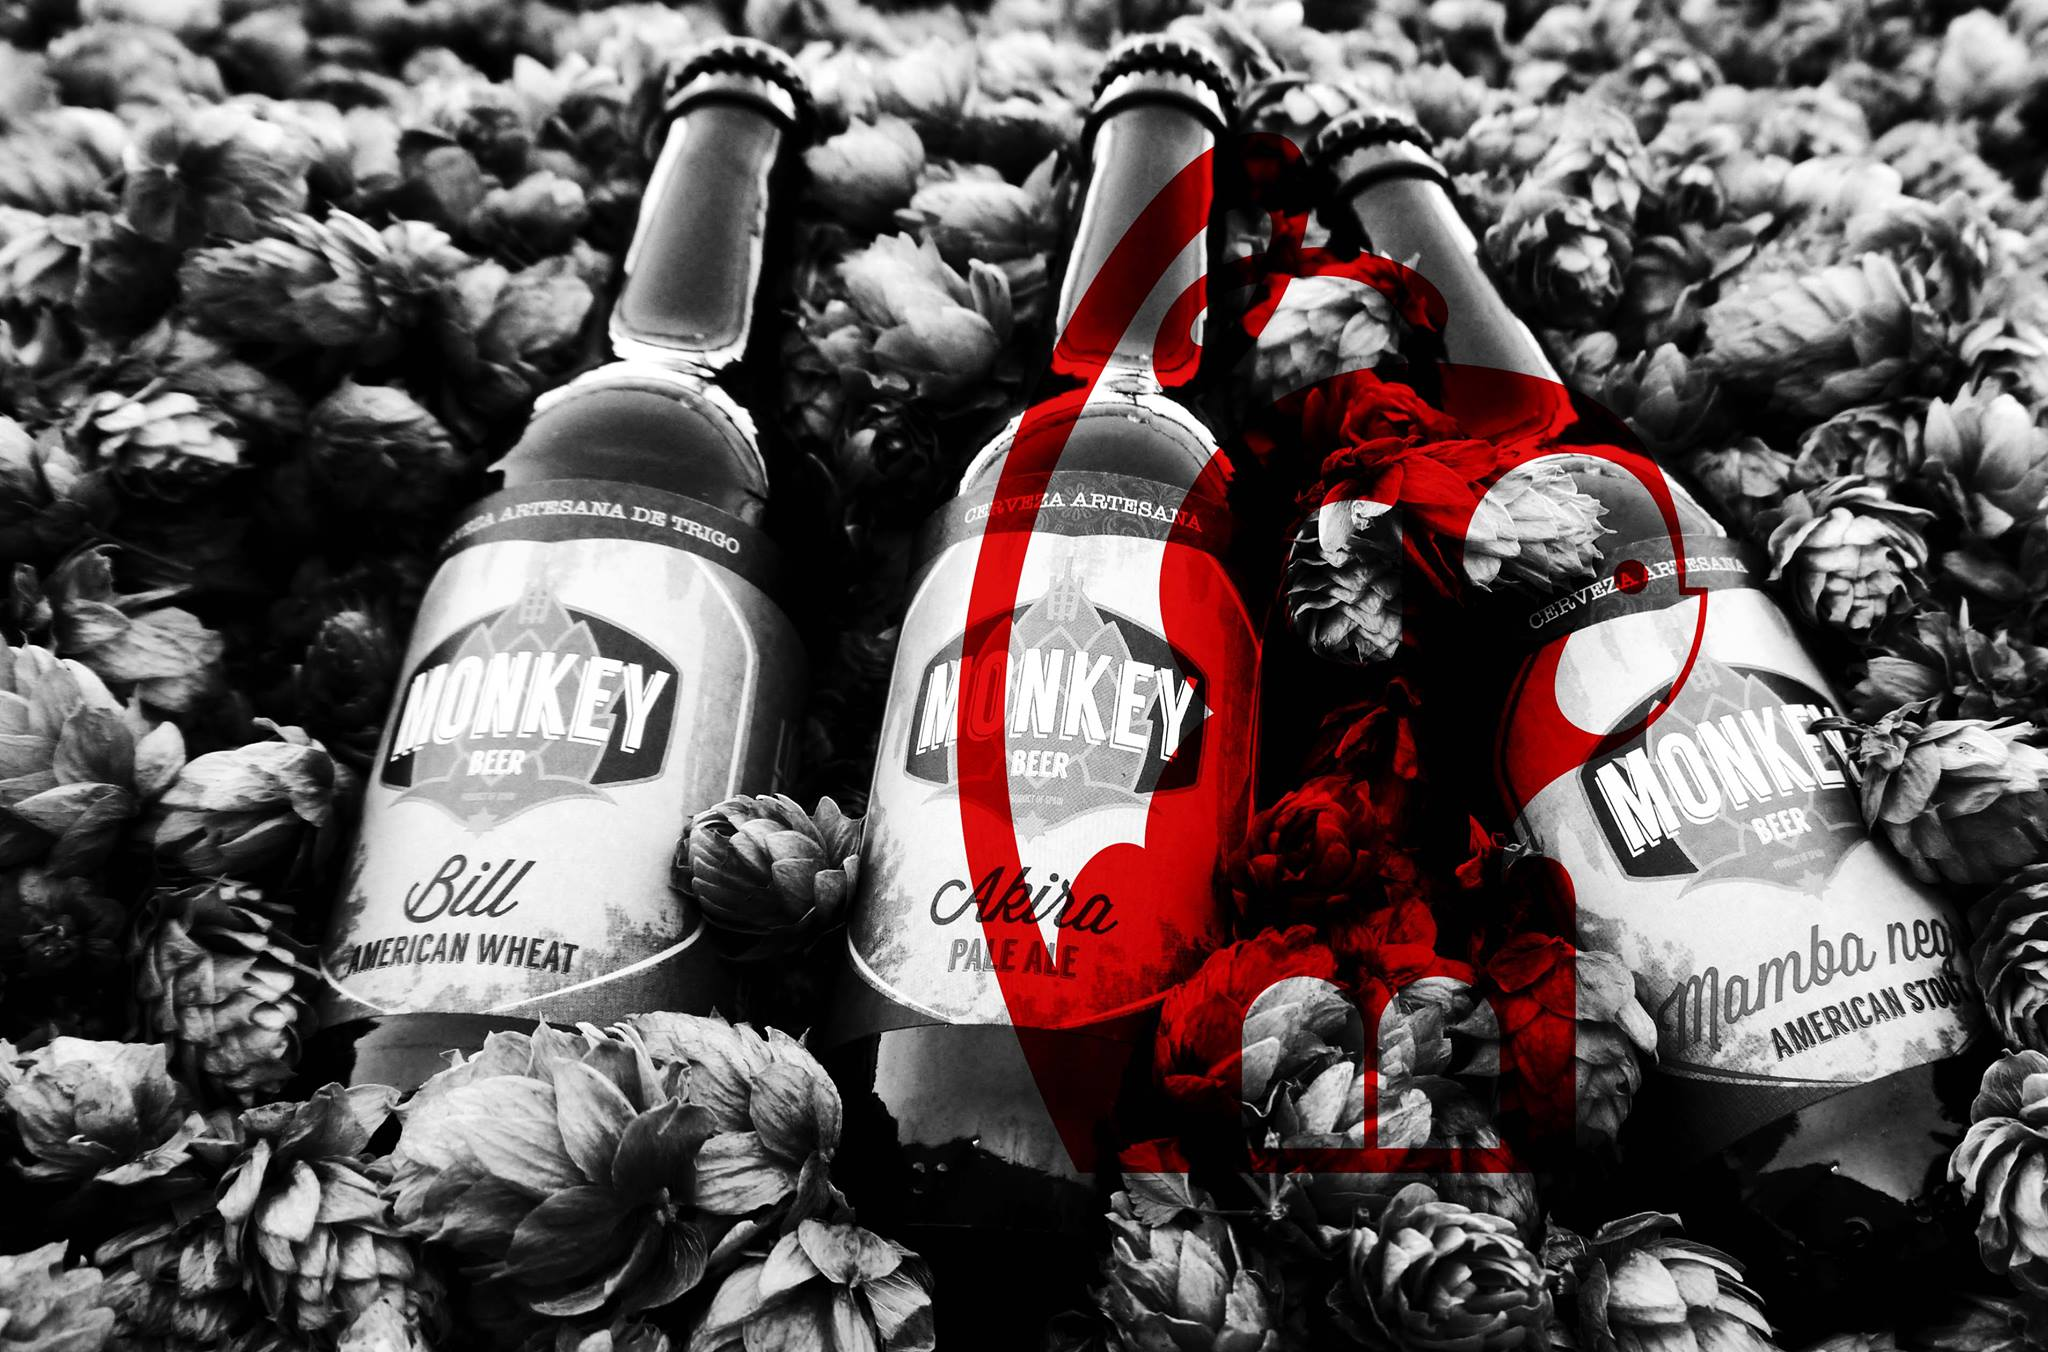 Cervezas Monkey, una empresa de cerveza artesana creada por emprendedores españoles